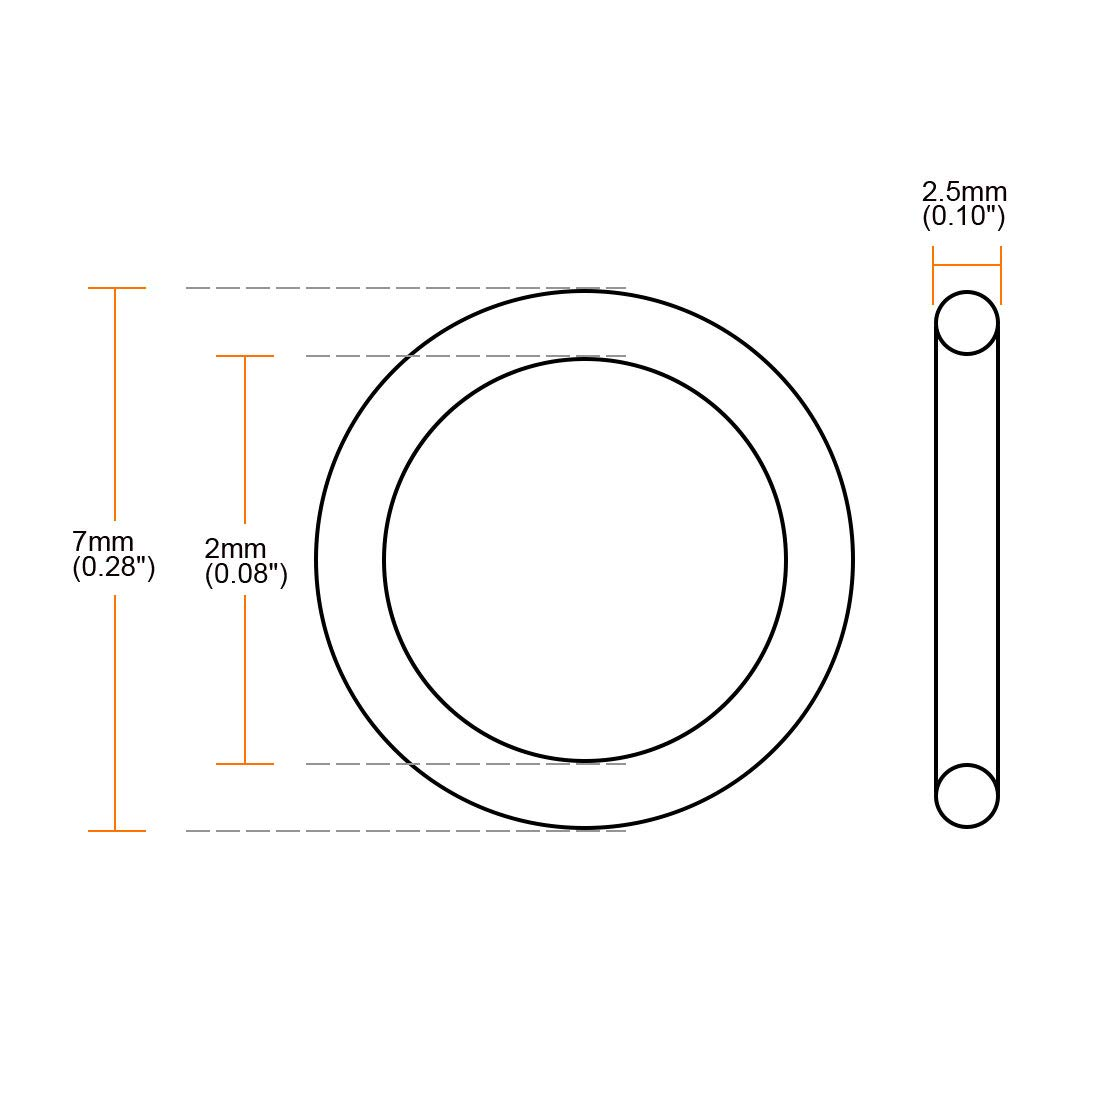 7mm OD 2mm ID 2.5mm Width Metric Buna-N Sealing Gasket uxcell Nitrile Rubber O-Rings Pack of 200